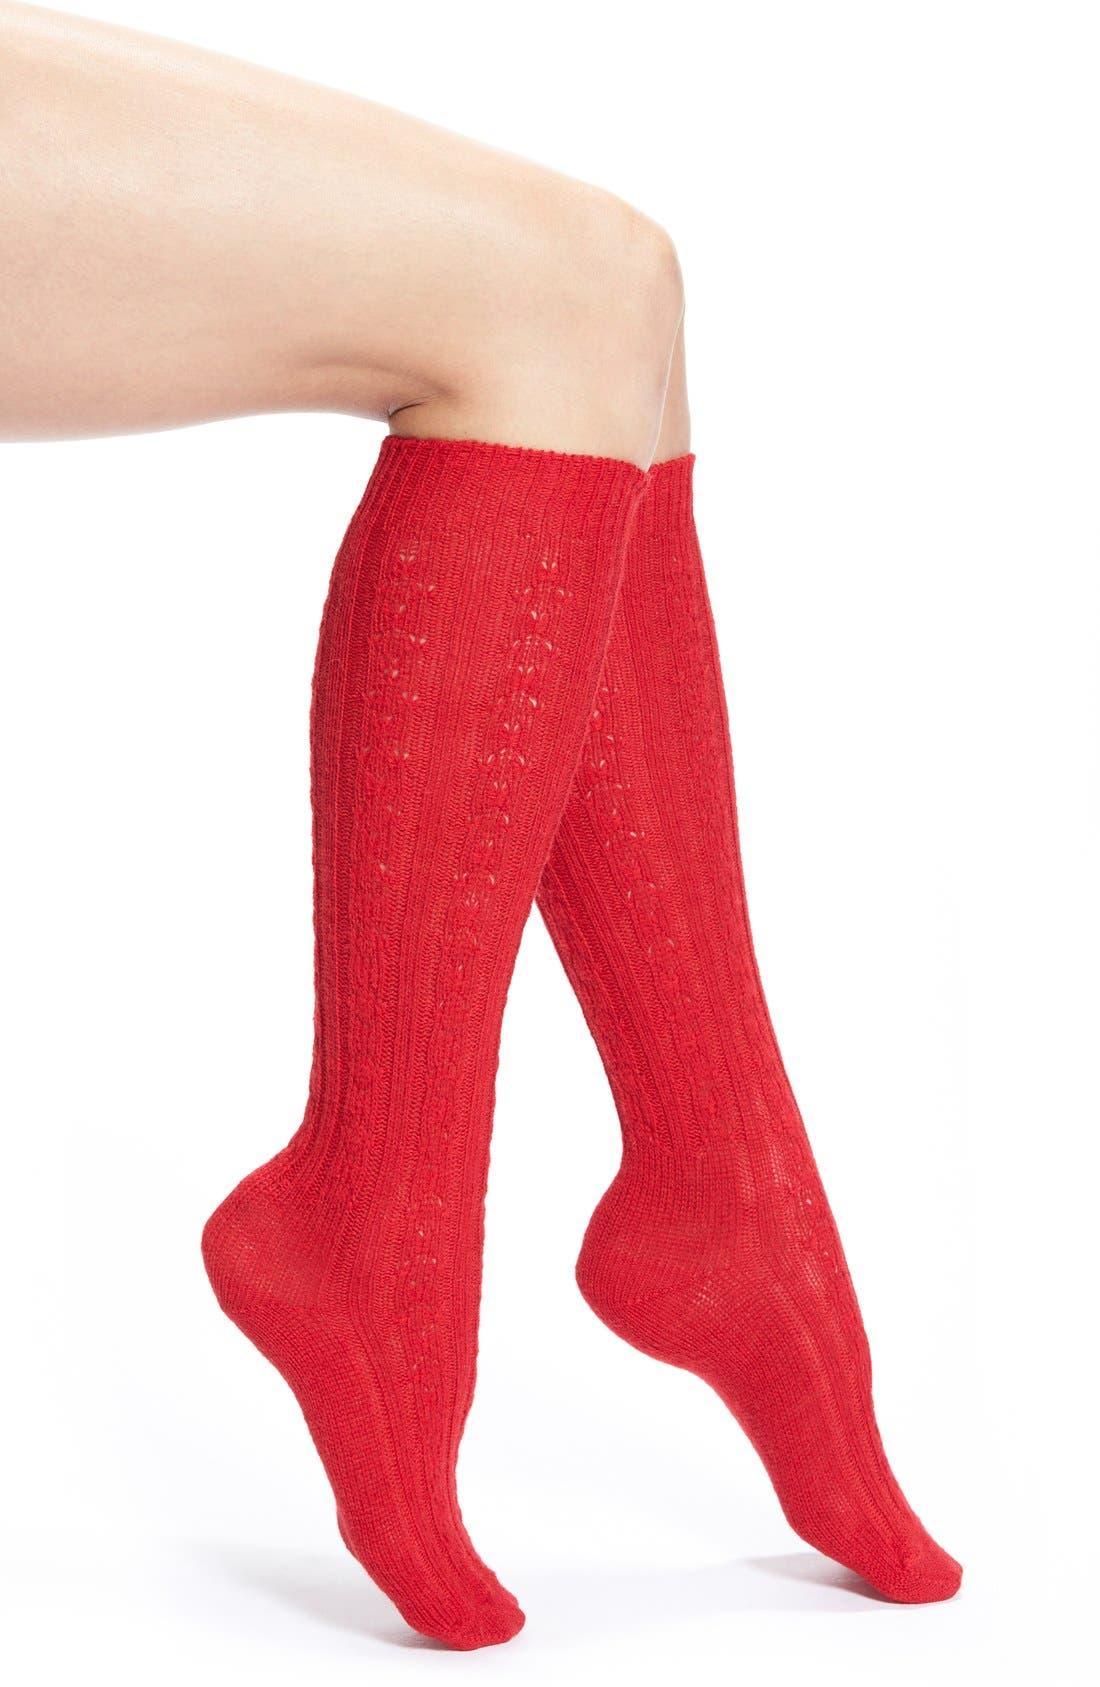 Cable Knit Knee Socks,                             Main thumbnail 4, color,